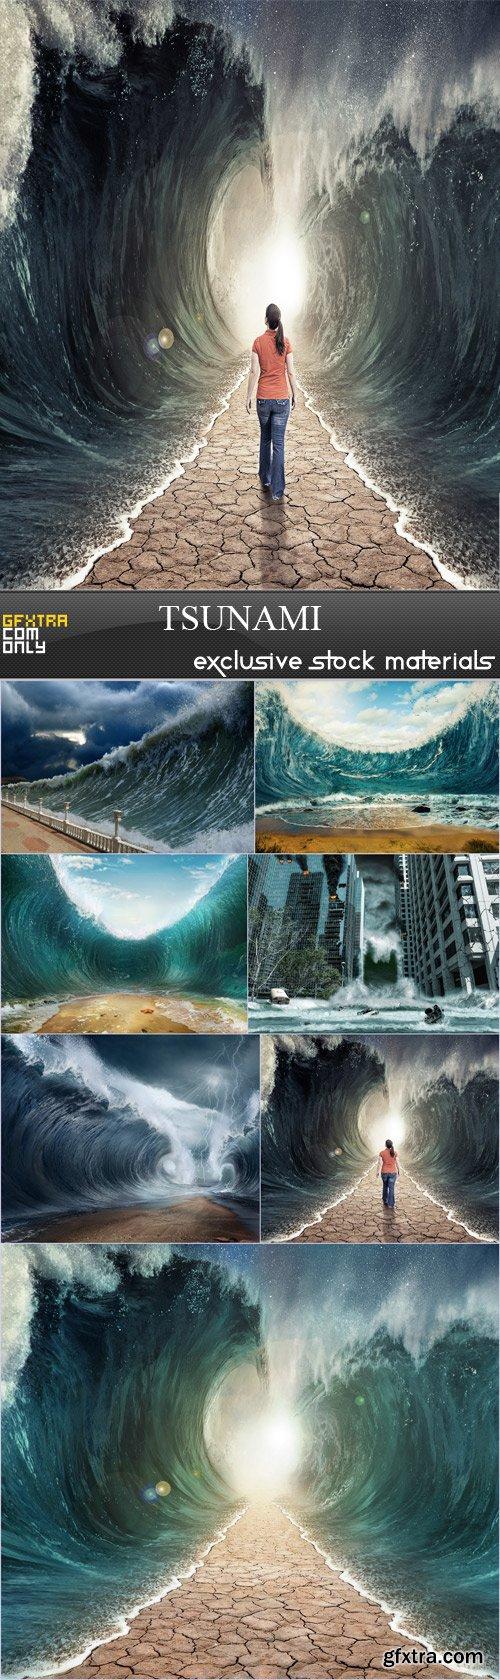 Tsunami - 7 JPRGs